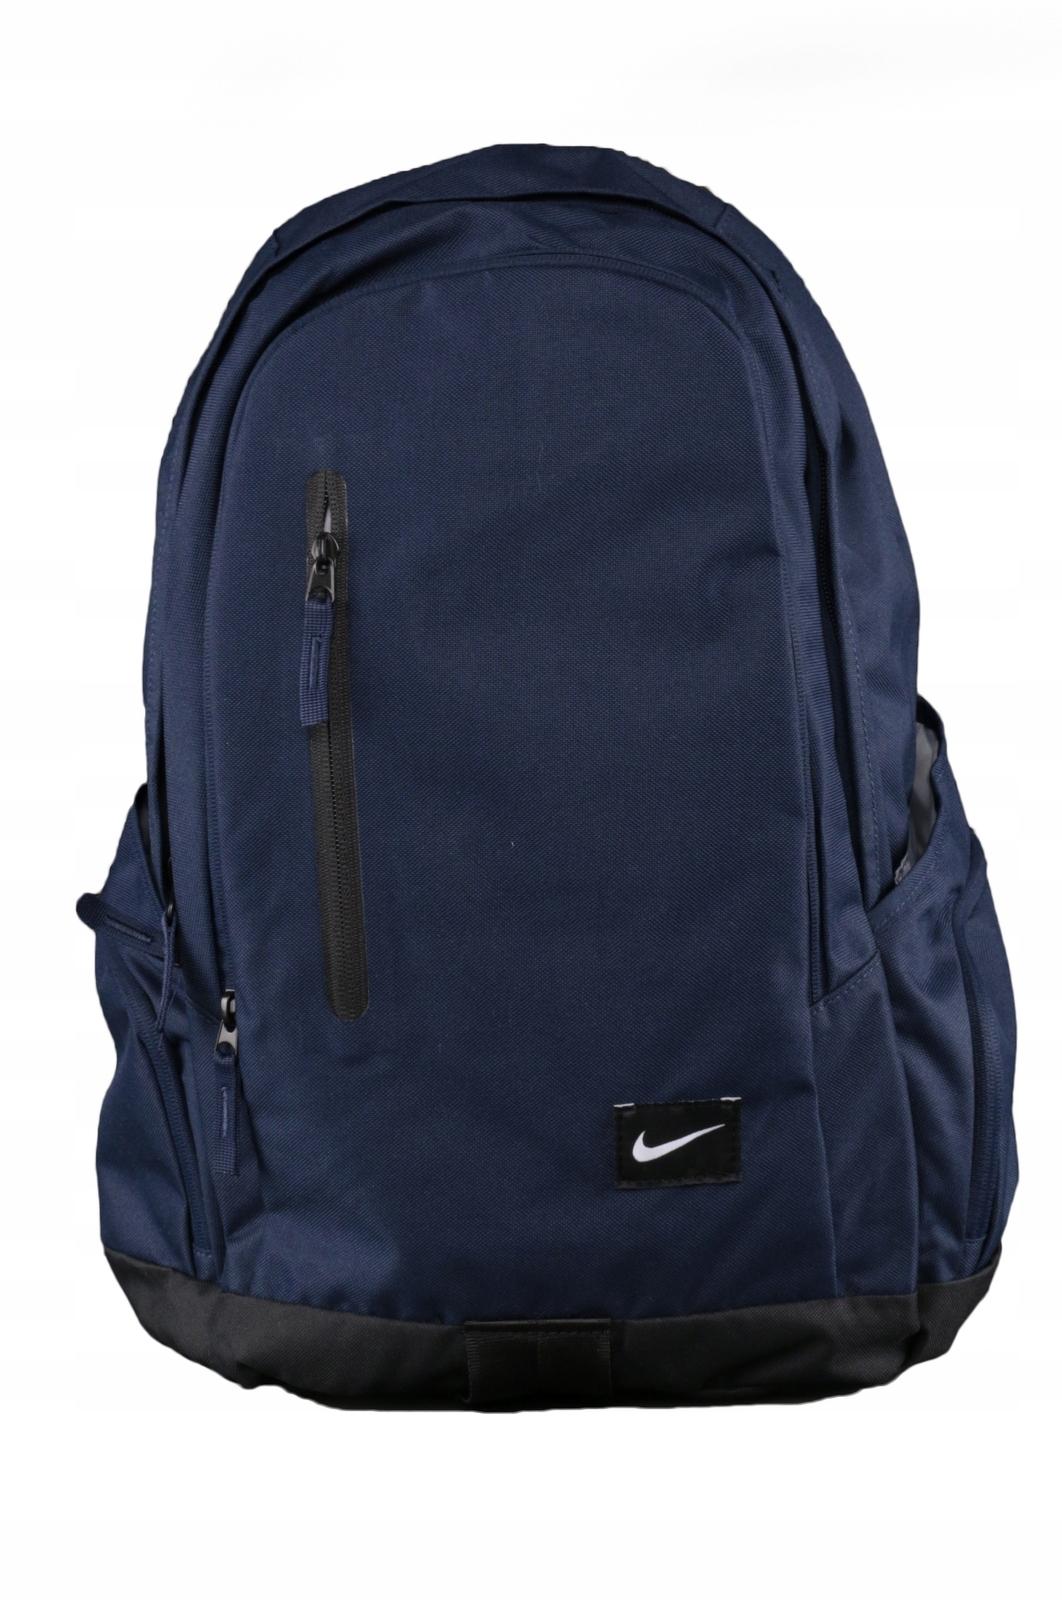 Plecak Nike ALL ACCESS FULLFARE BA4855-468 - 7566537542 - oficjalne ... dd66db92821d4